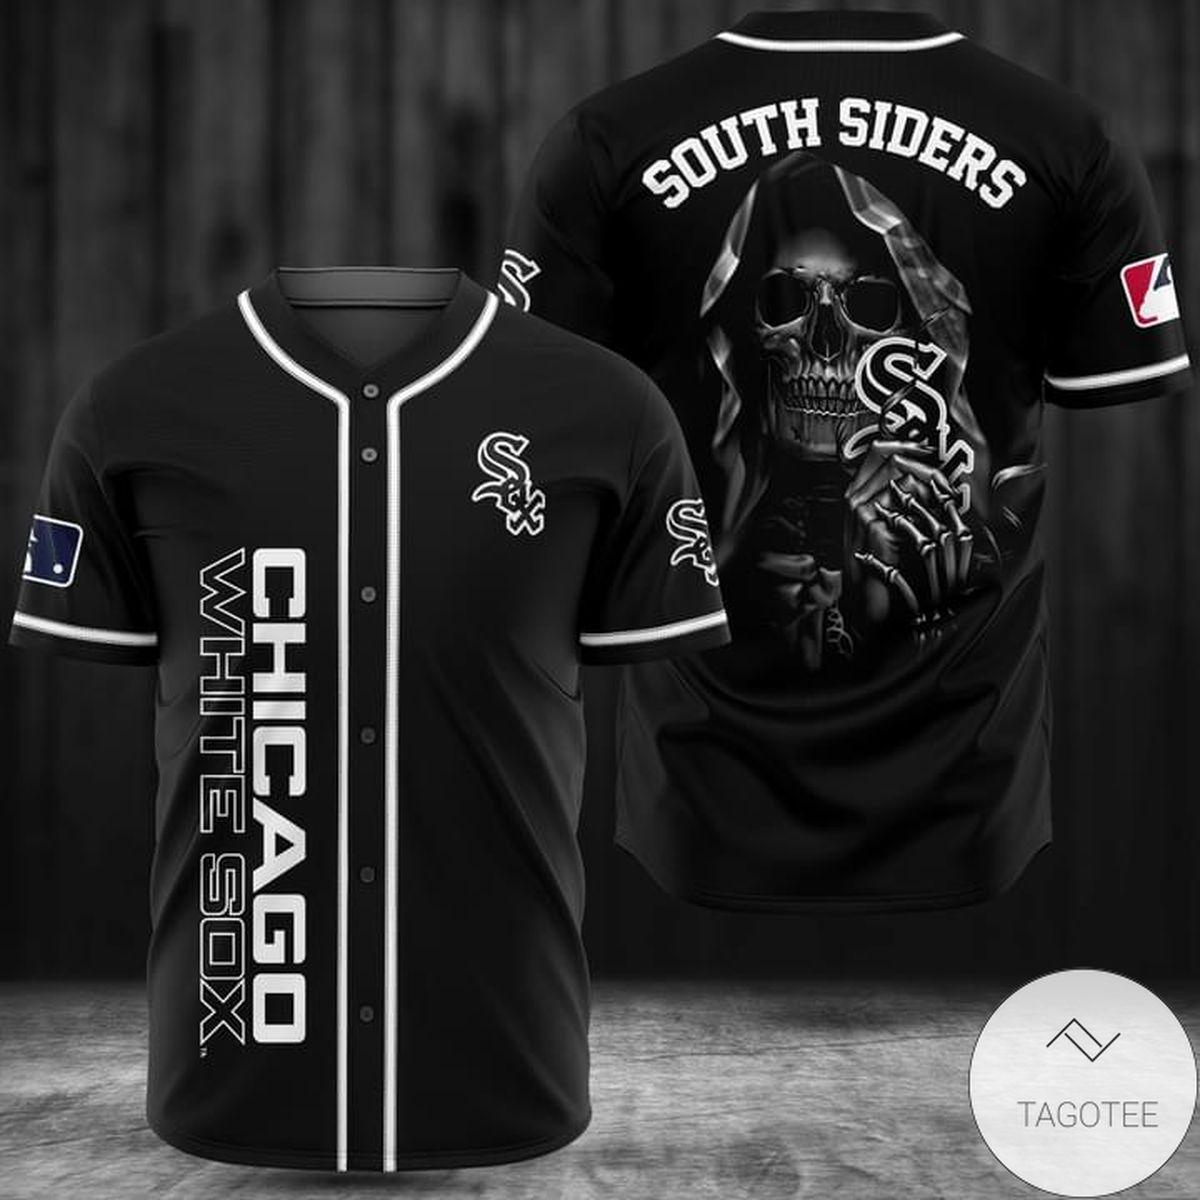 Chicago White Sox Baseball Jerseys